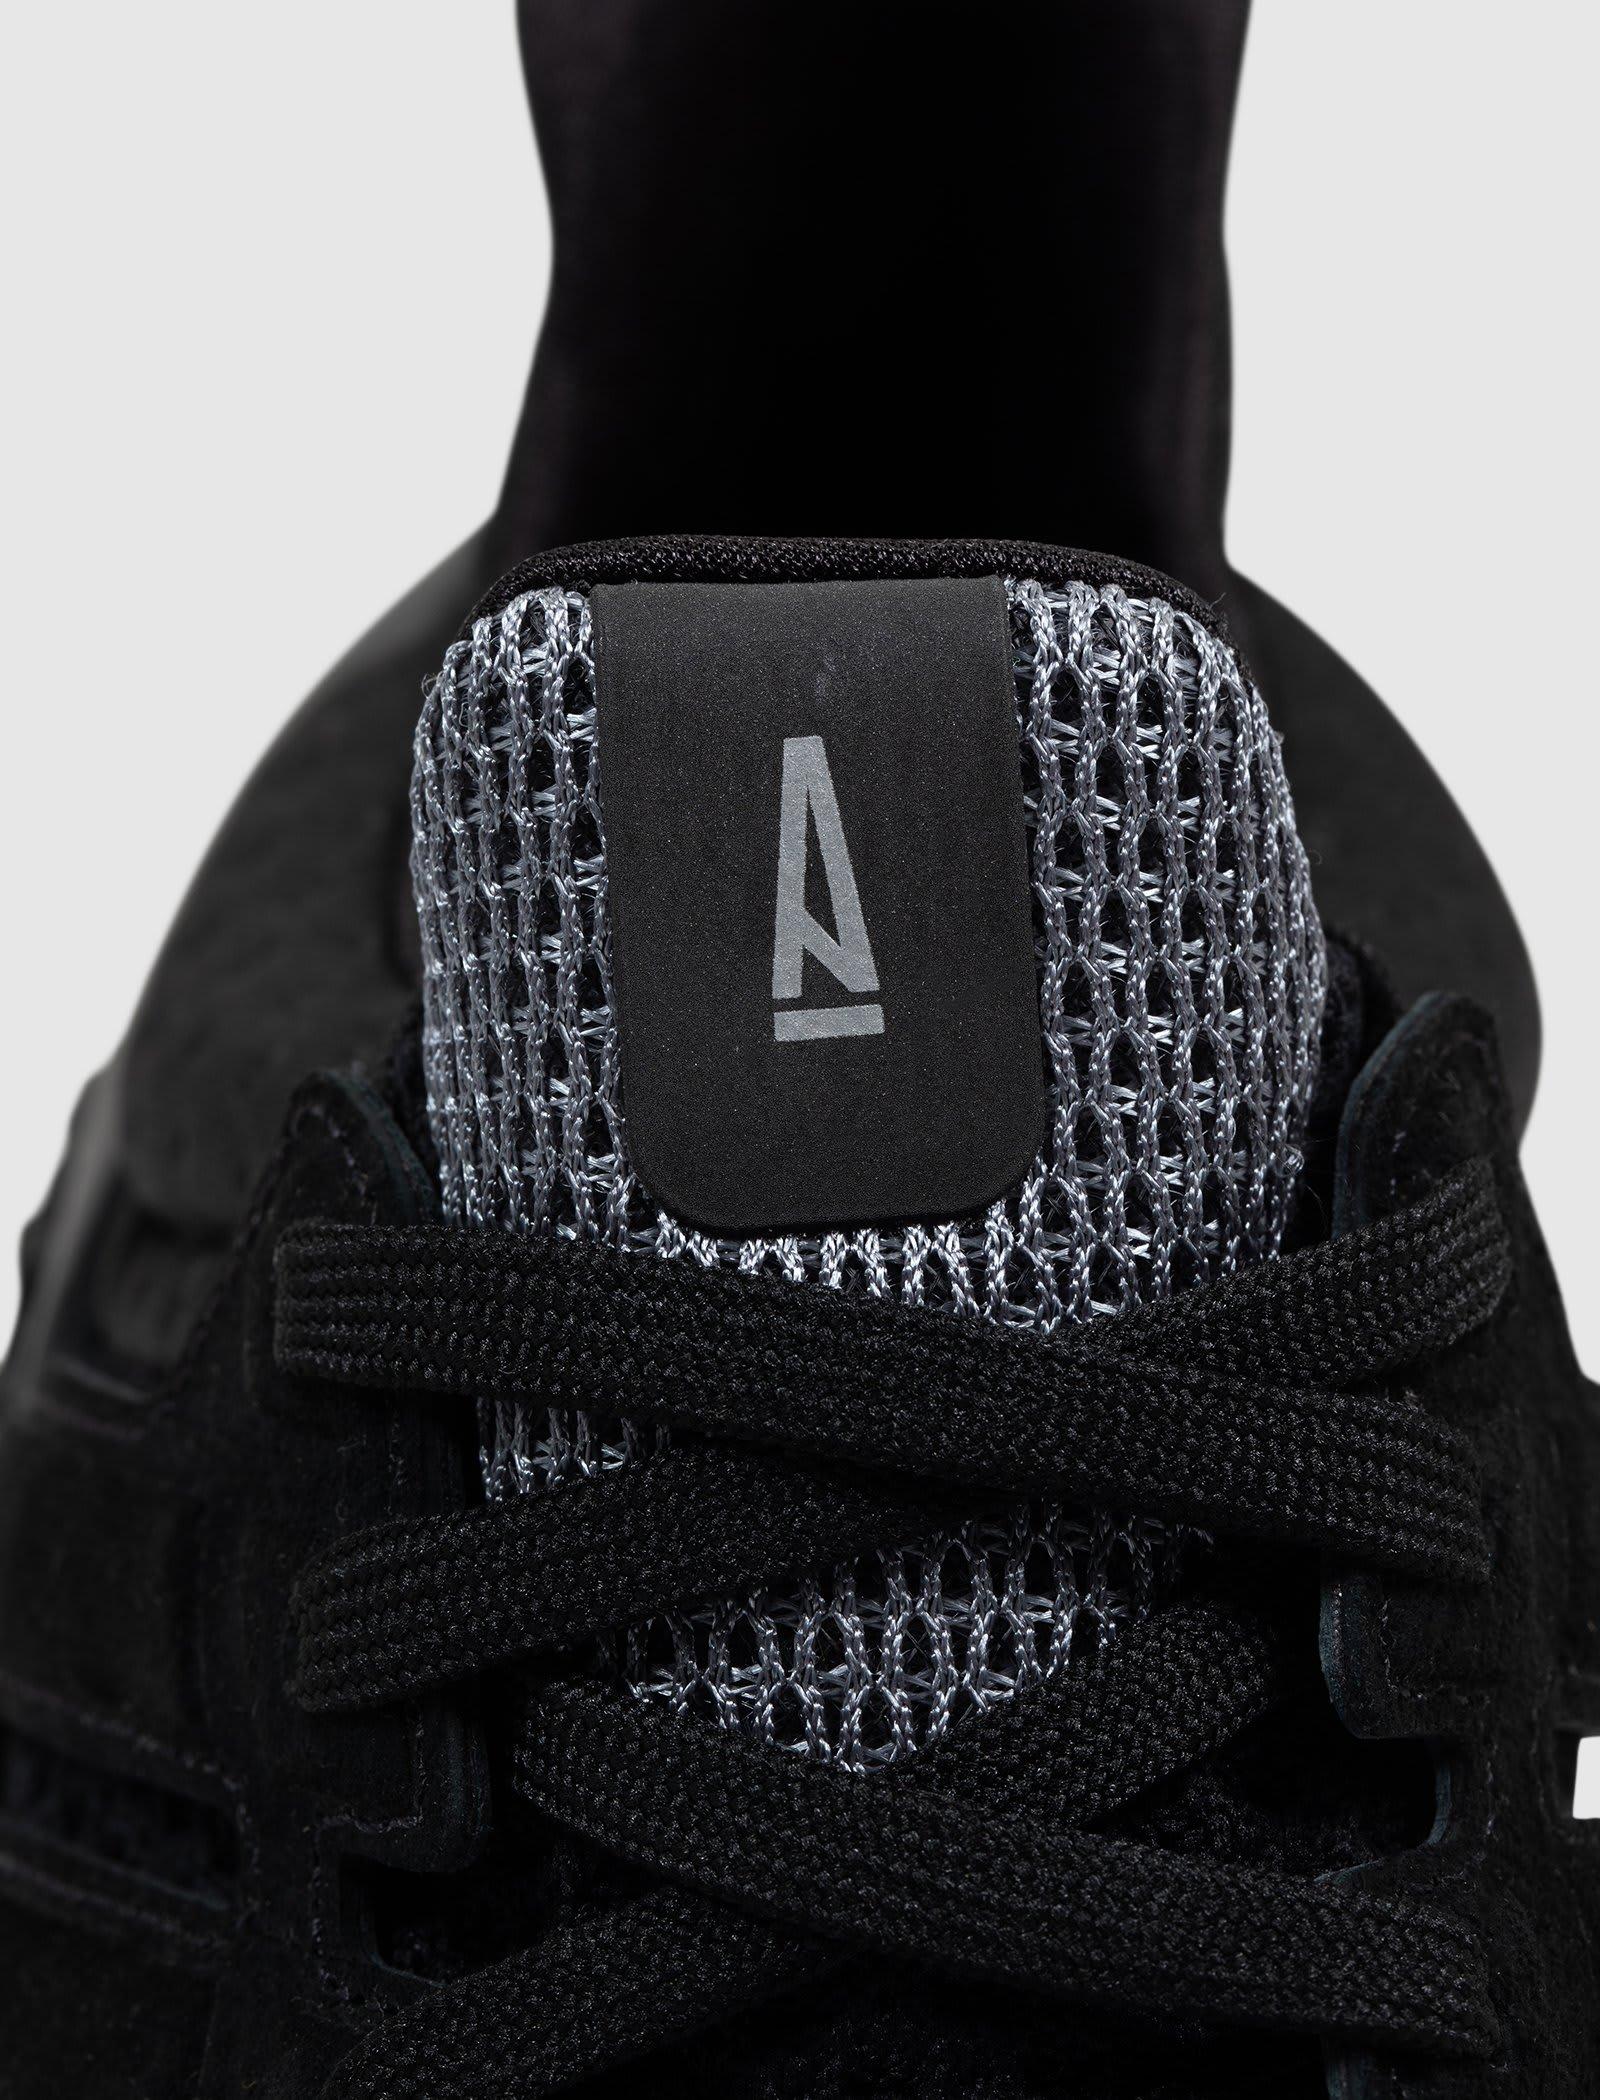 A Ma Maniere Adidas Ultra 4D G55274 Release Date Tongue Detail